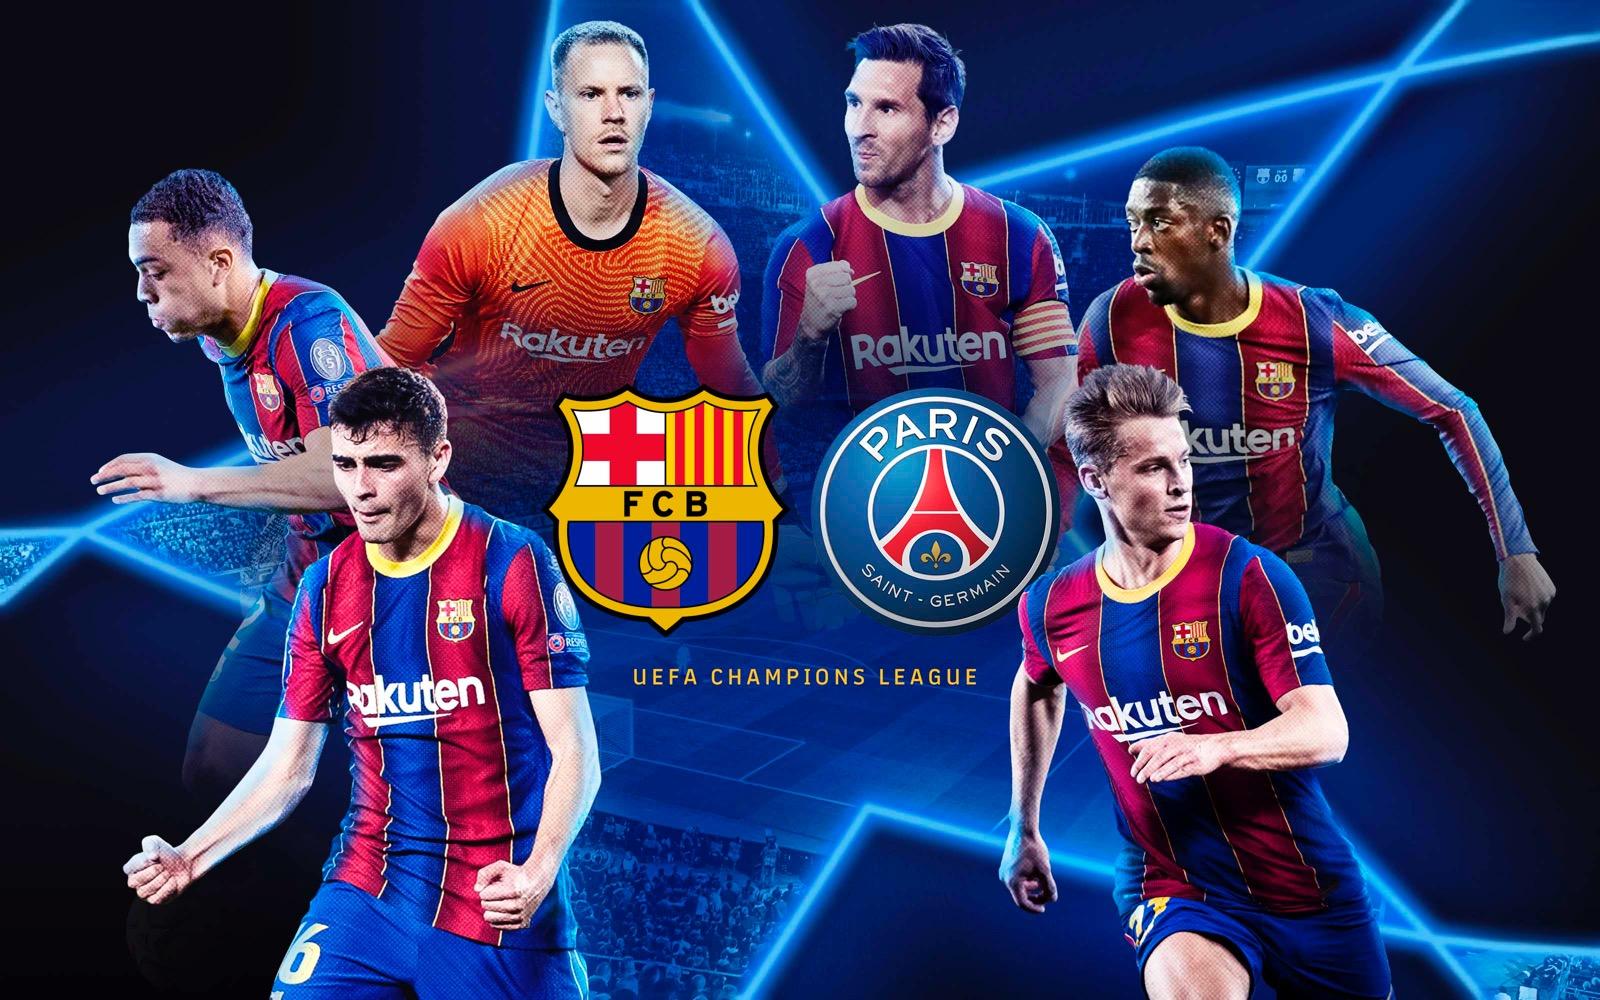 Barcelona vs PSG Live Stream Champions League, The Quarter Final